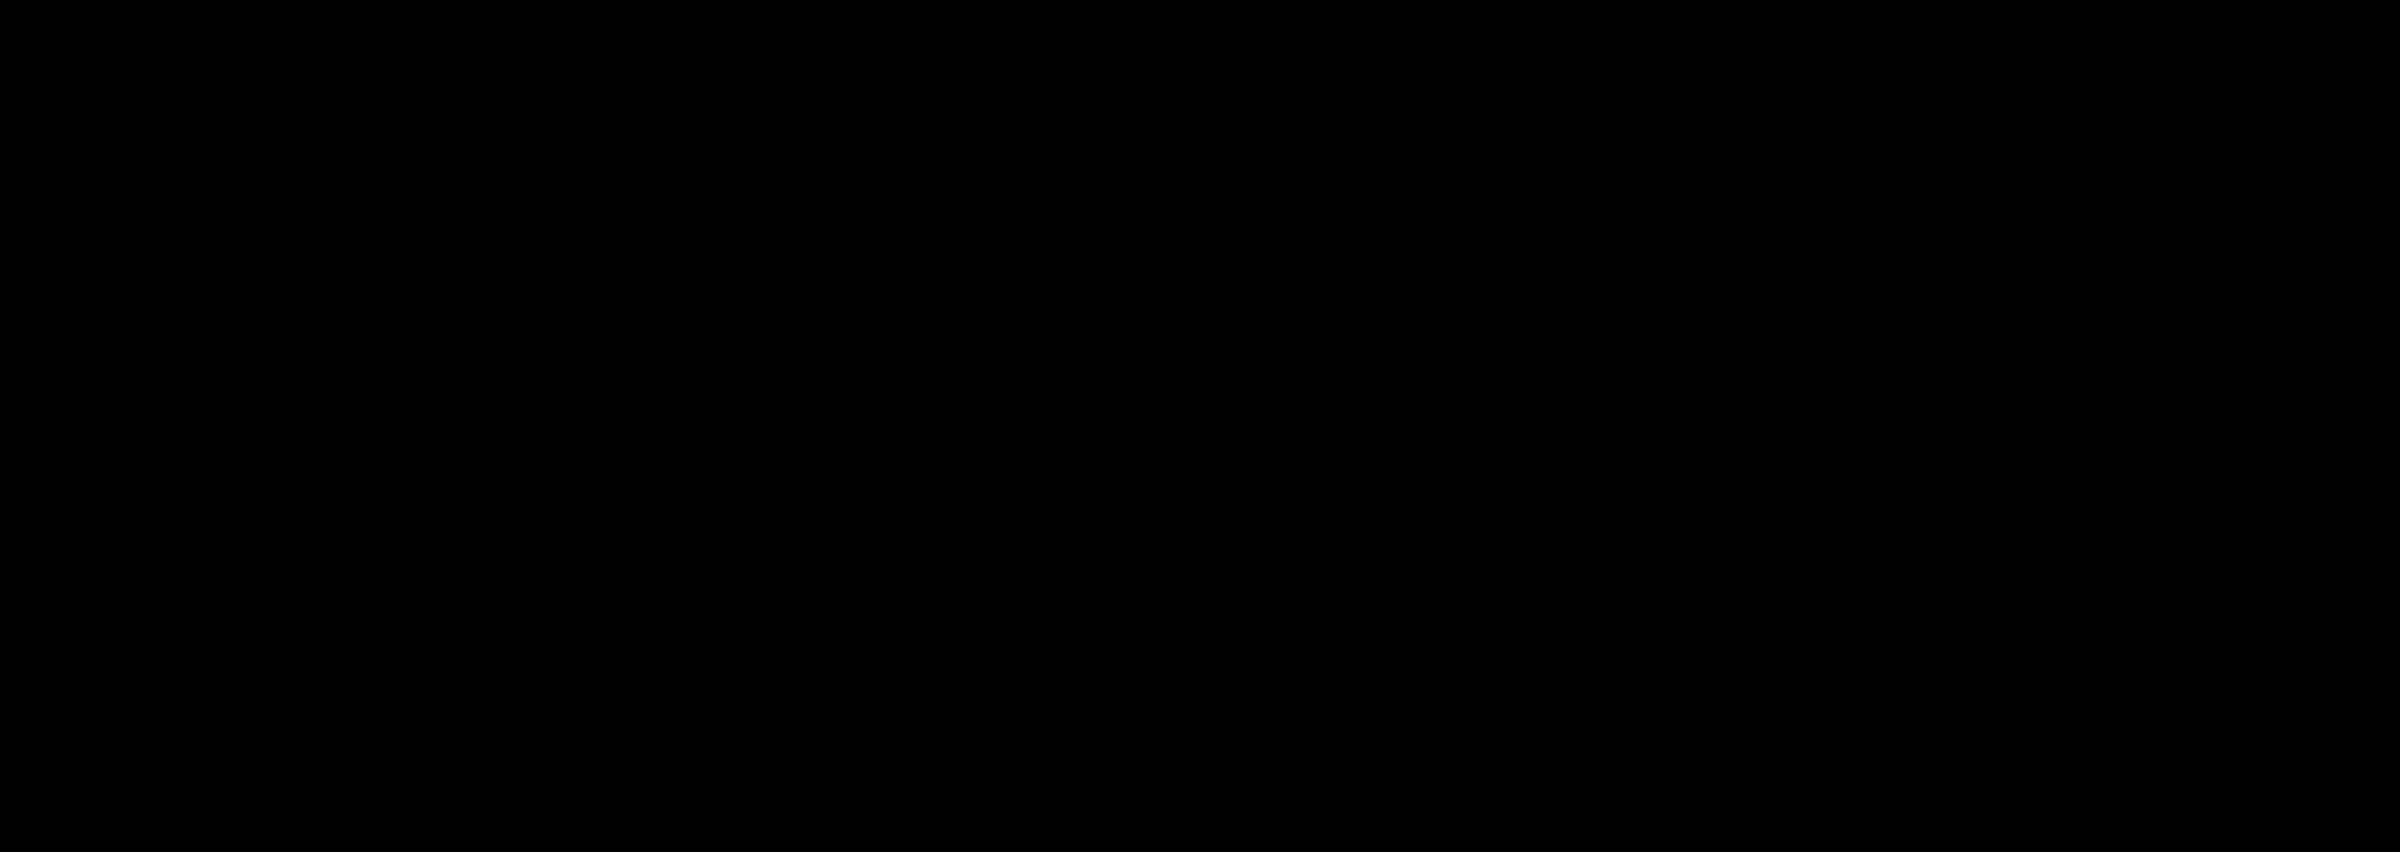 Big image png. Clipart shark lemon shark